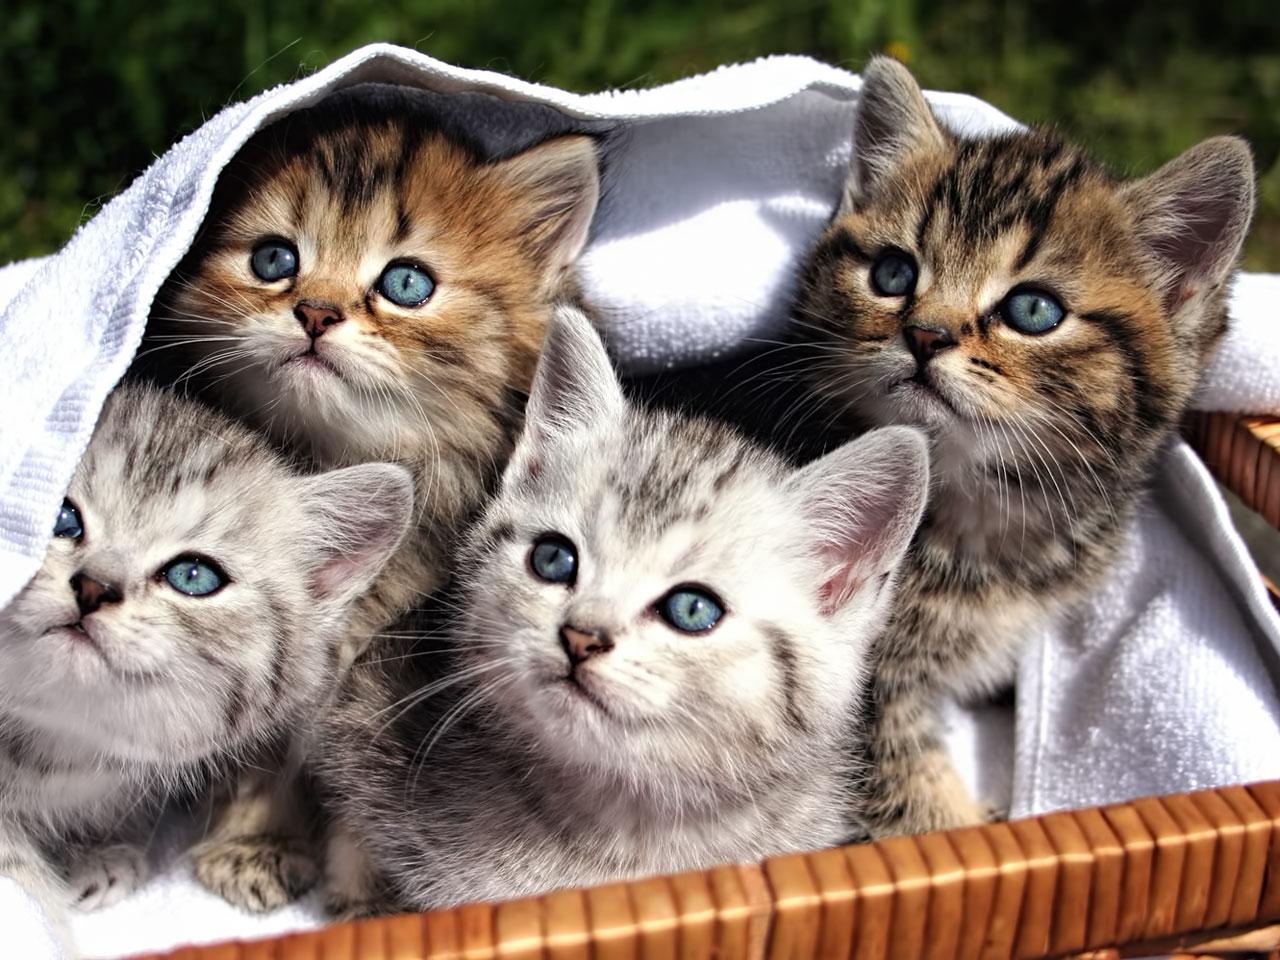 Katzenbabys Kleinanzeigen Viele Babykatzen Abzugeben